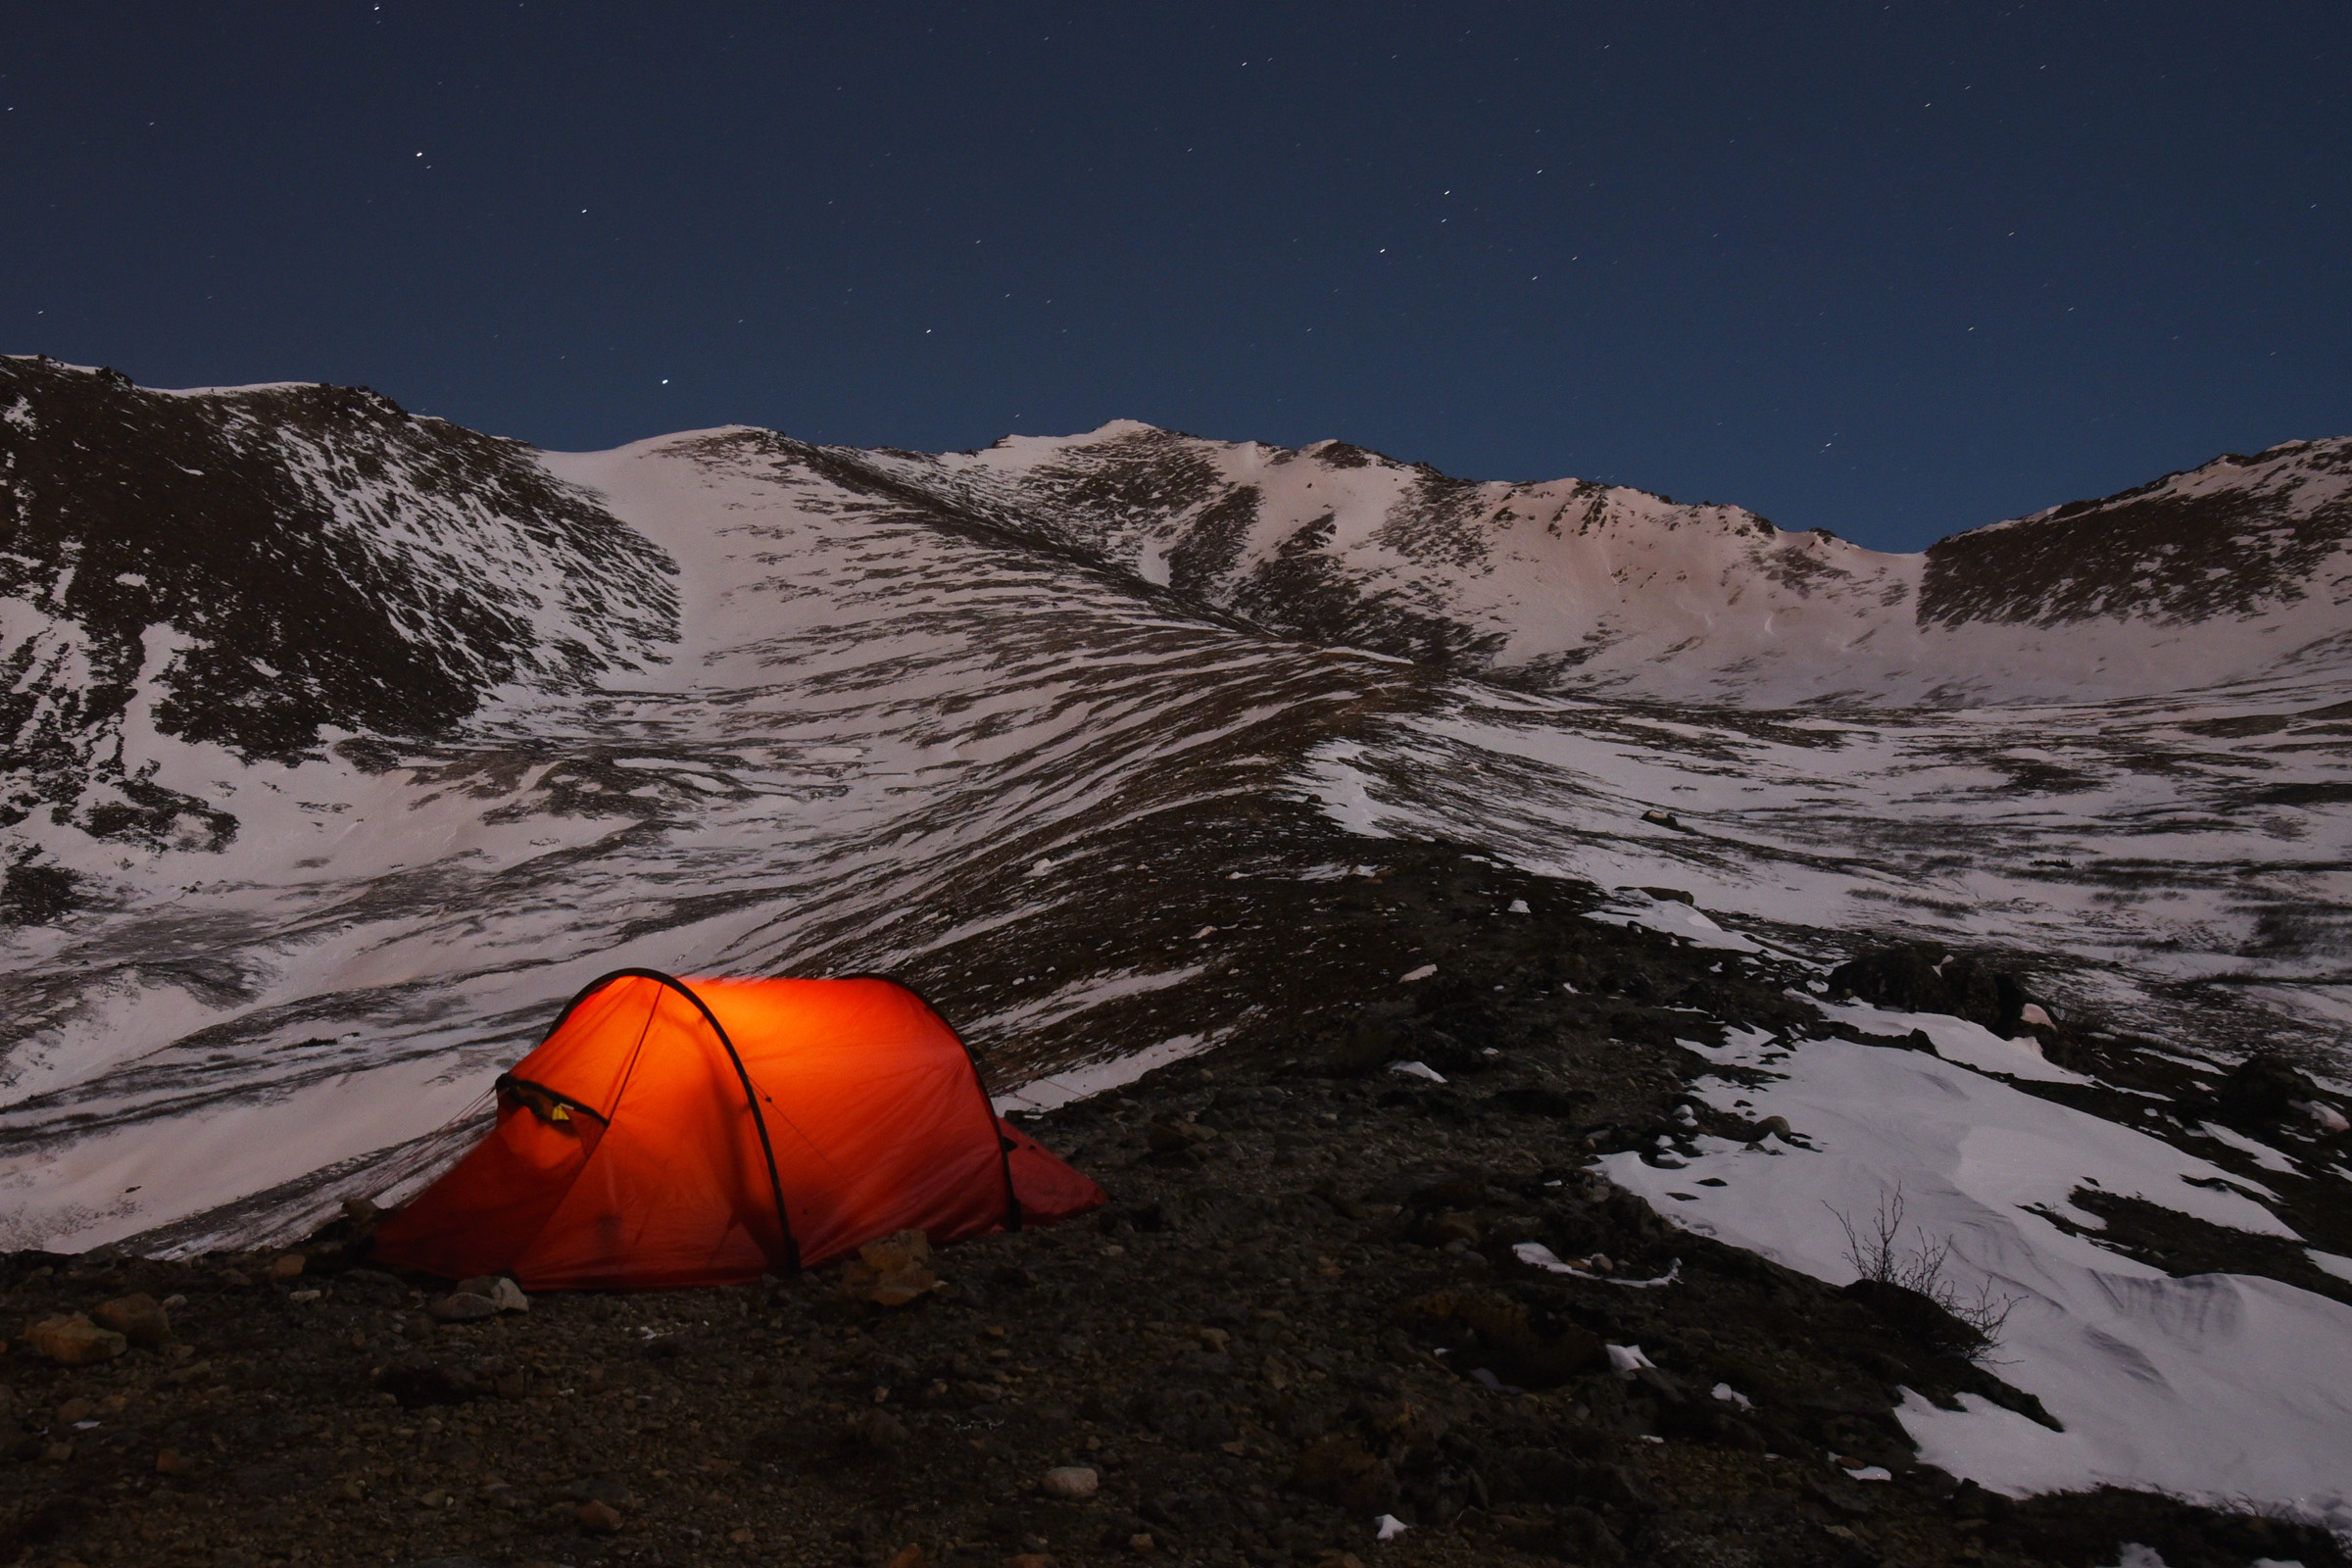 Hilleberg Nammatj 2 on Wolverine Peak & Hilleberg Nammatj 2 tent review | Winterbear.com product reviews